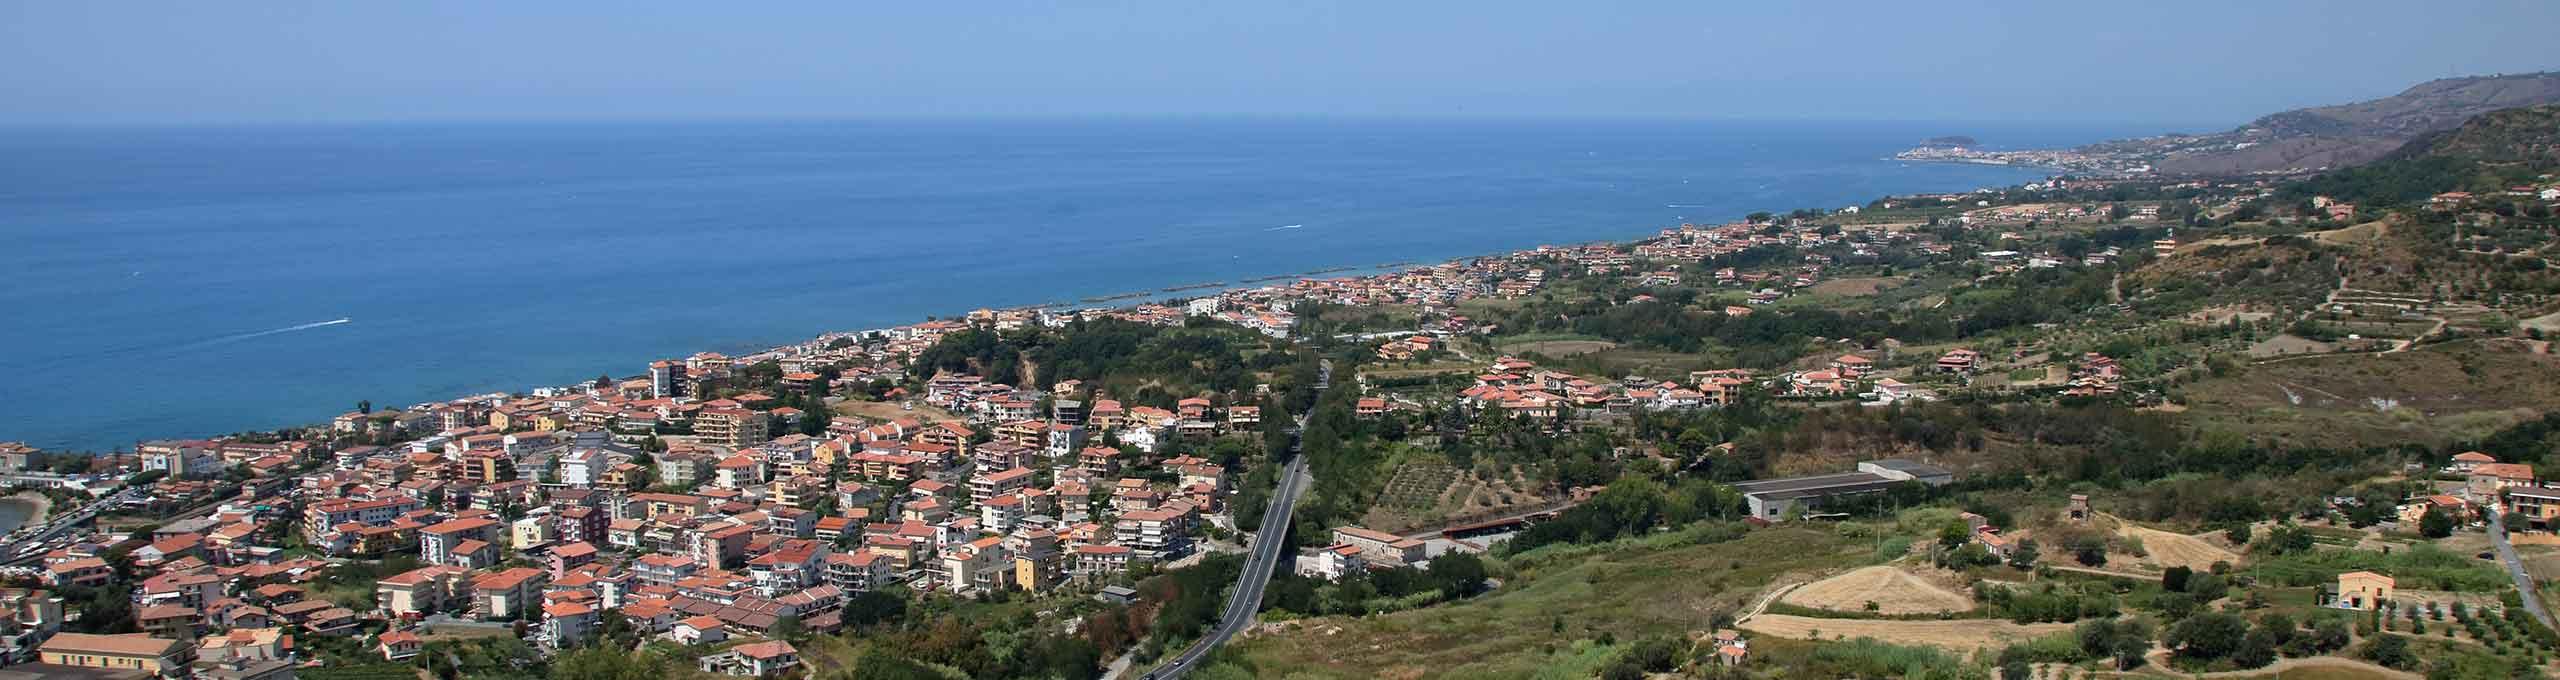 Belvedere Marittimo, Calabria